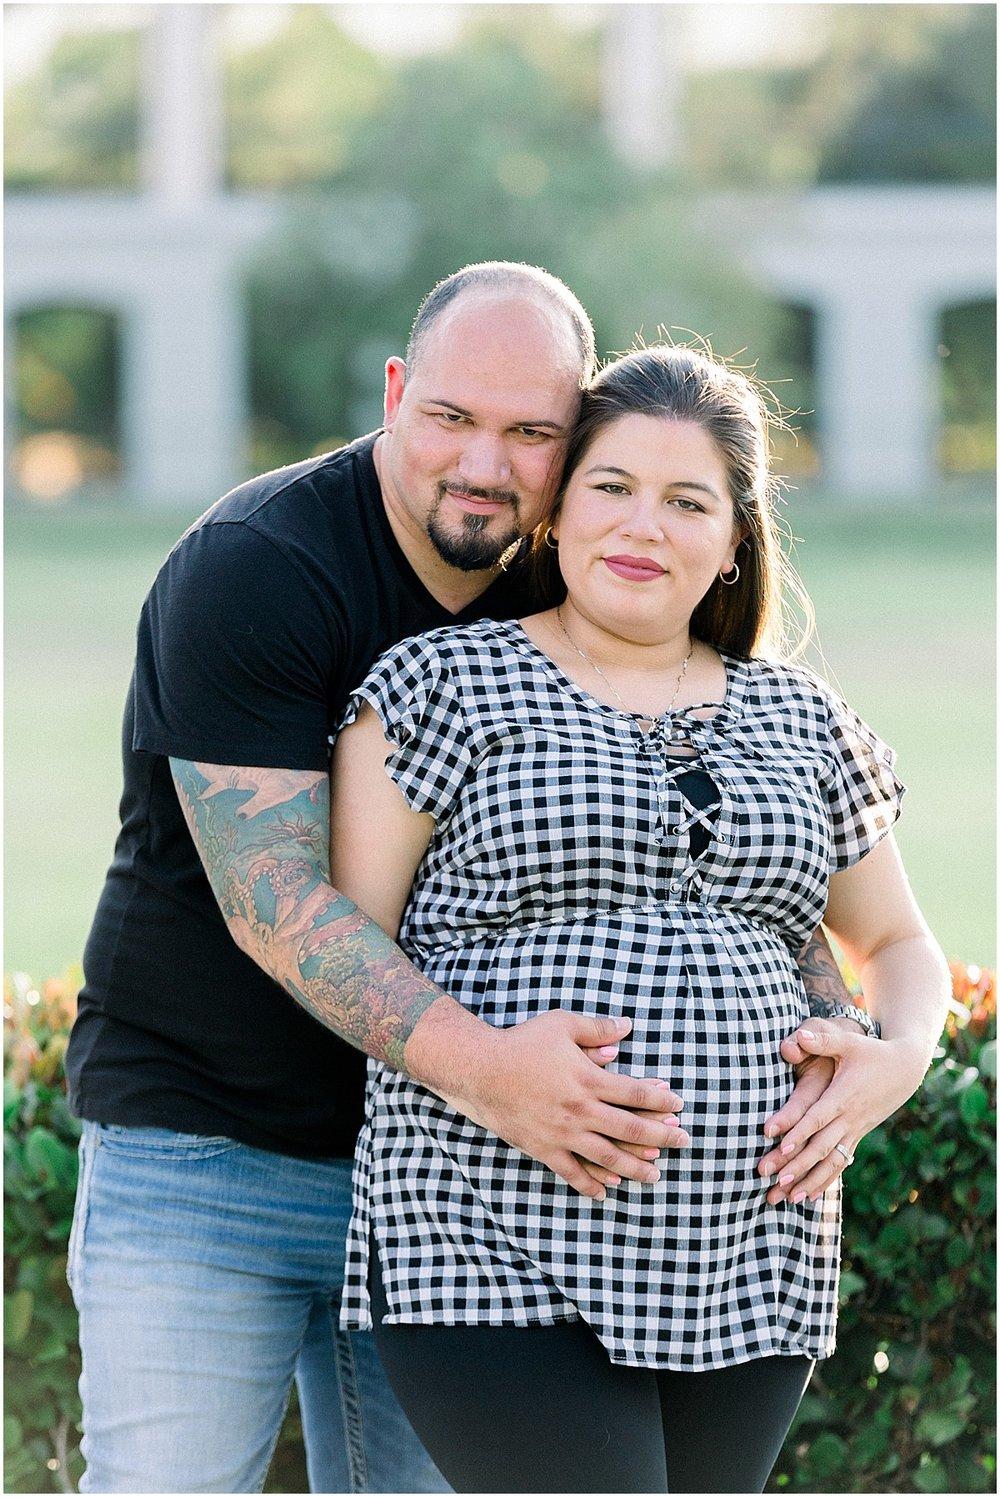 south-florida-maternity-photographer_0010.jpg